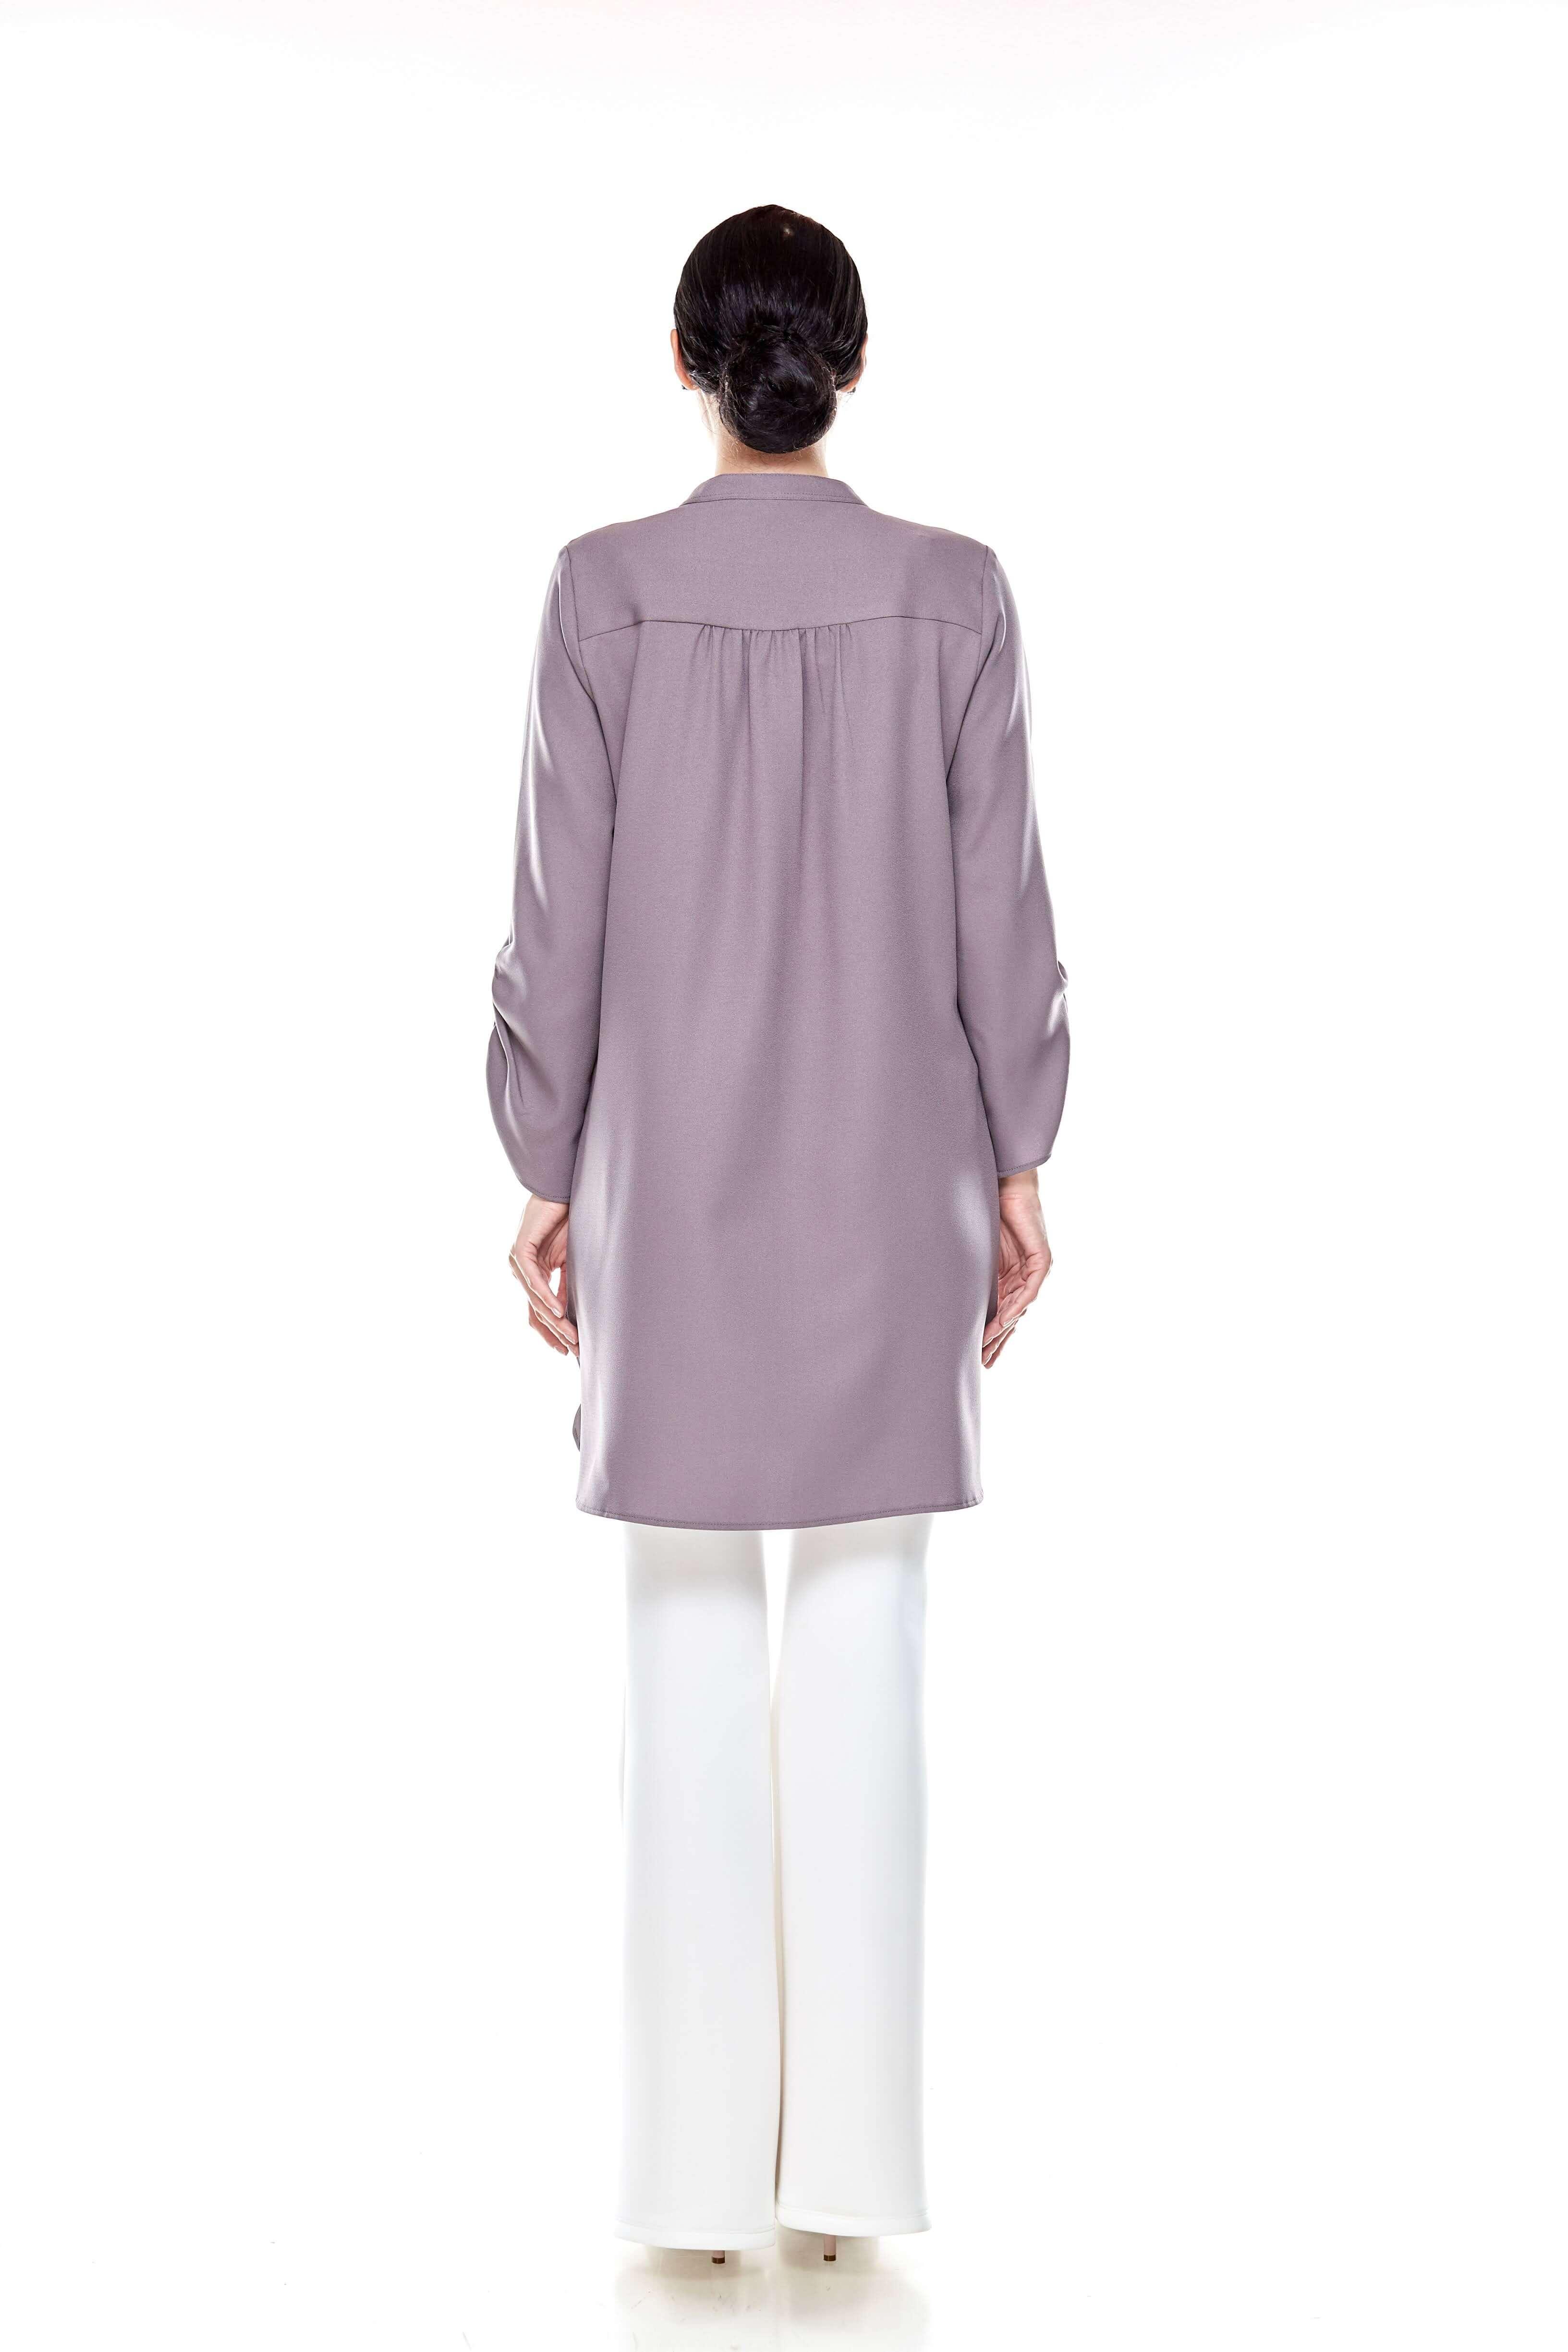 Cement Grey Shirt Blouse (5)